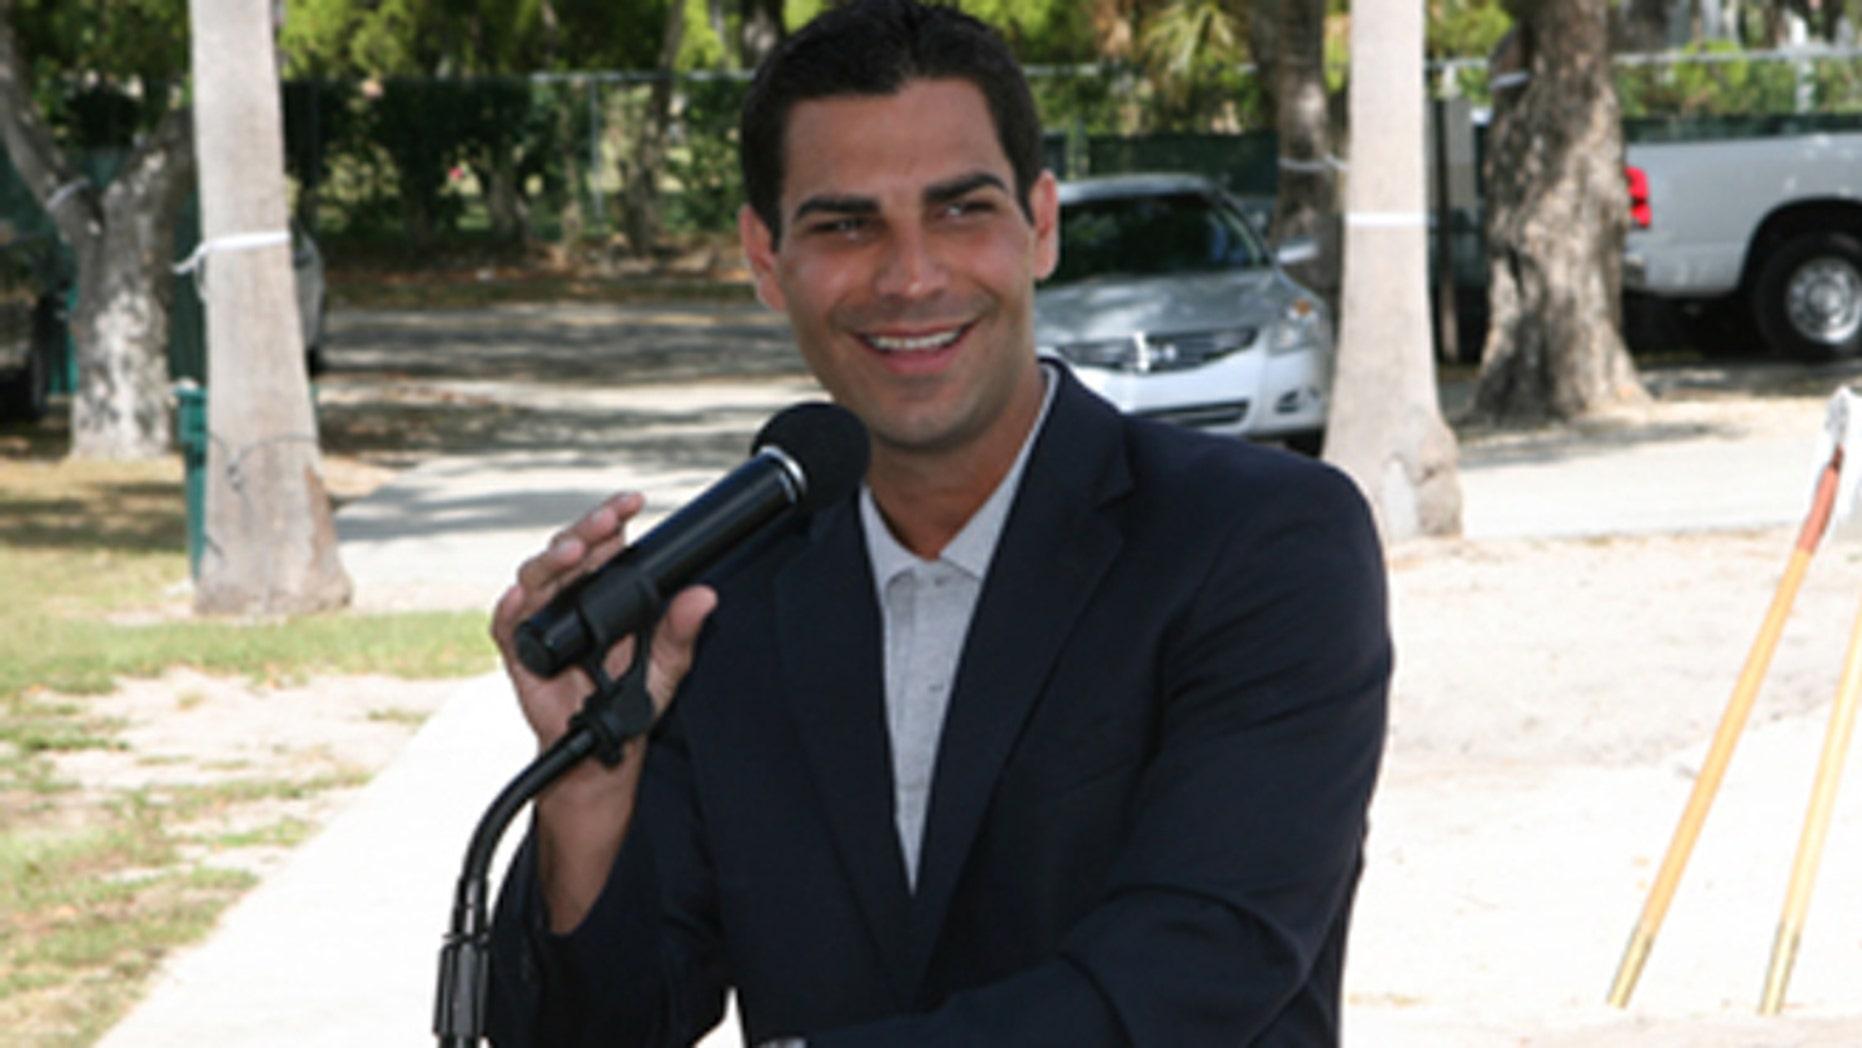 Miami Commissioner Francisco Suarez